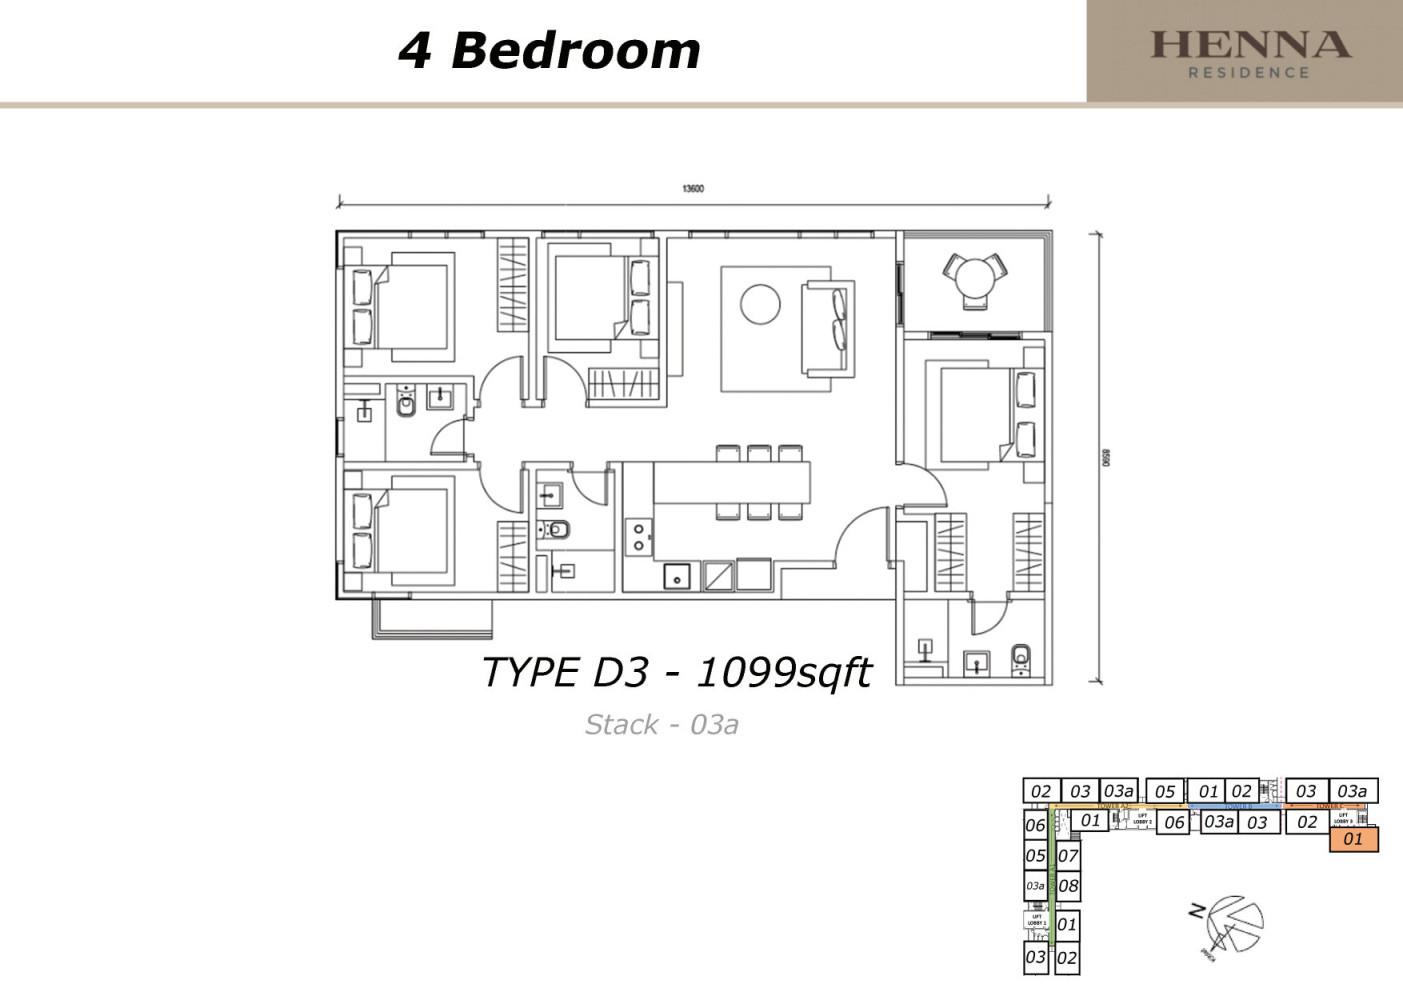 Henna Residence Type D3